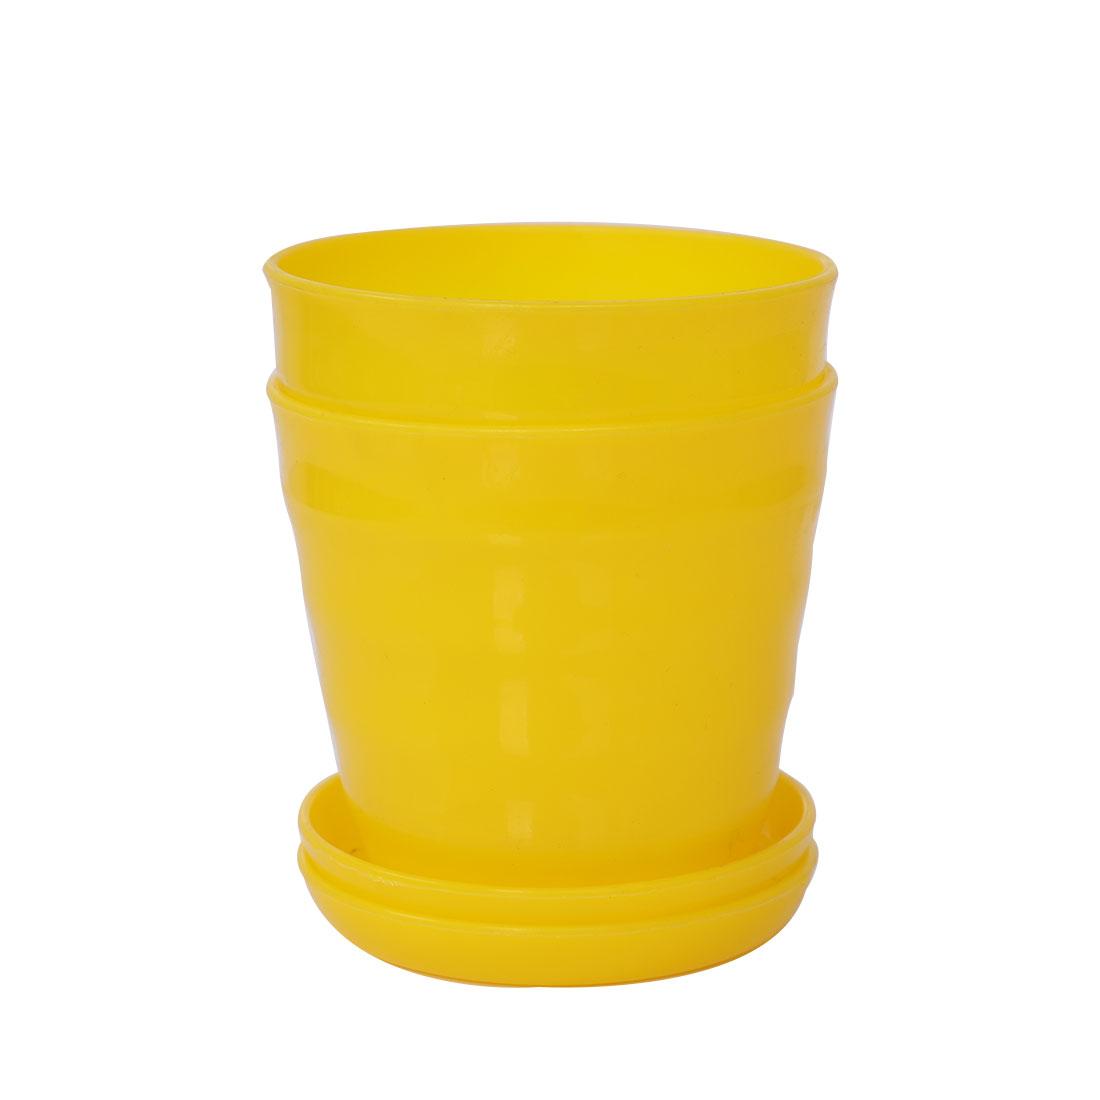 Apartment Desktop Plastic Round Cactus Plant Flower Seed Pot Tray Holder Yellow 2pcs